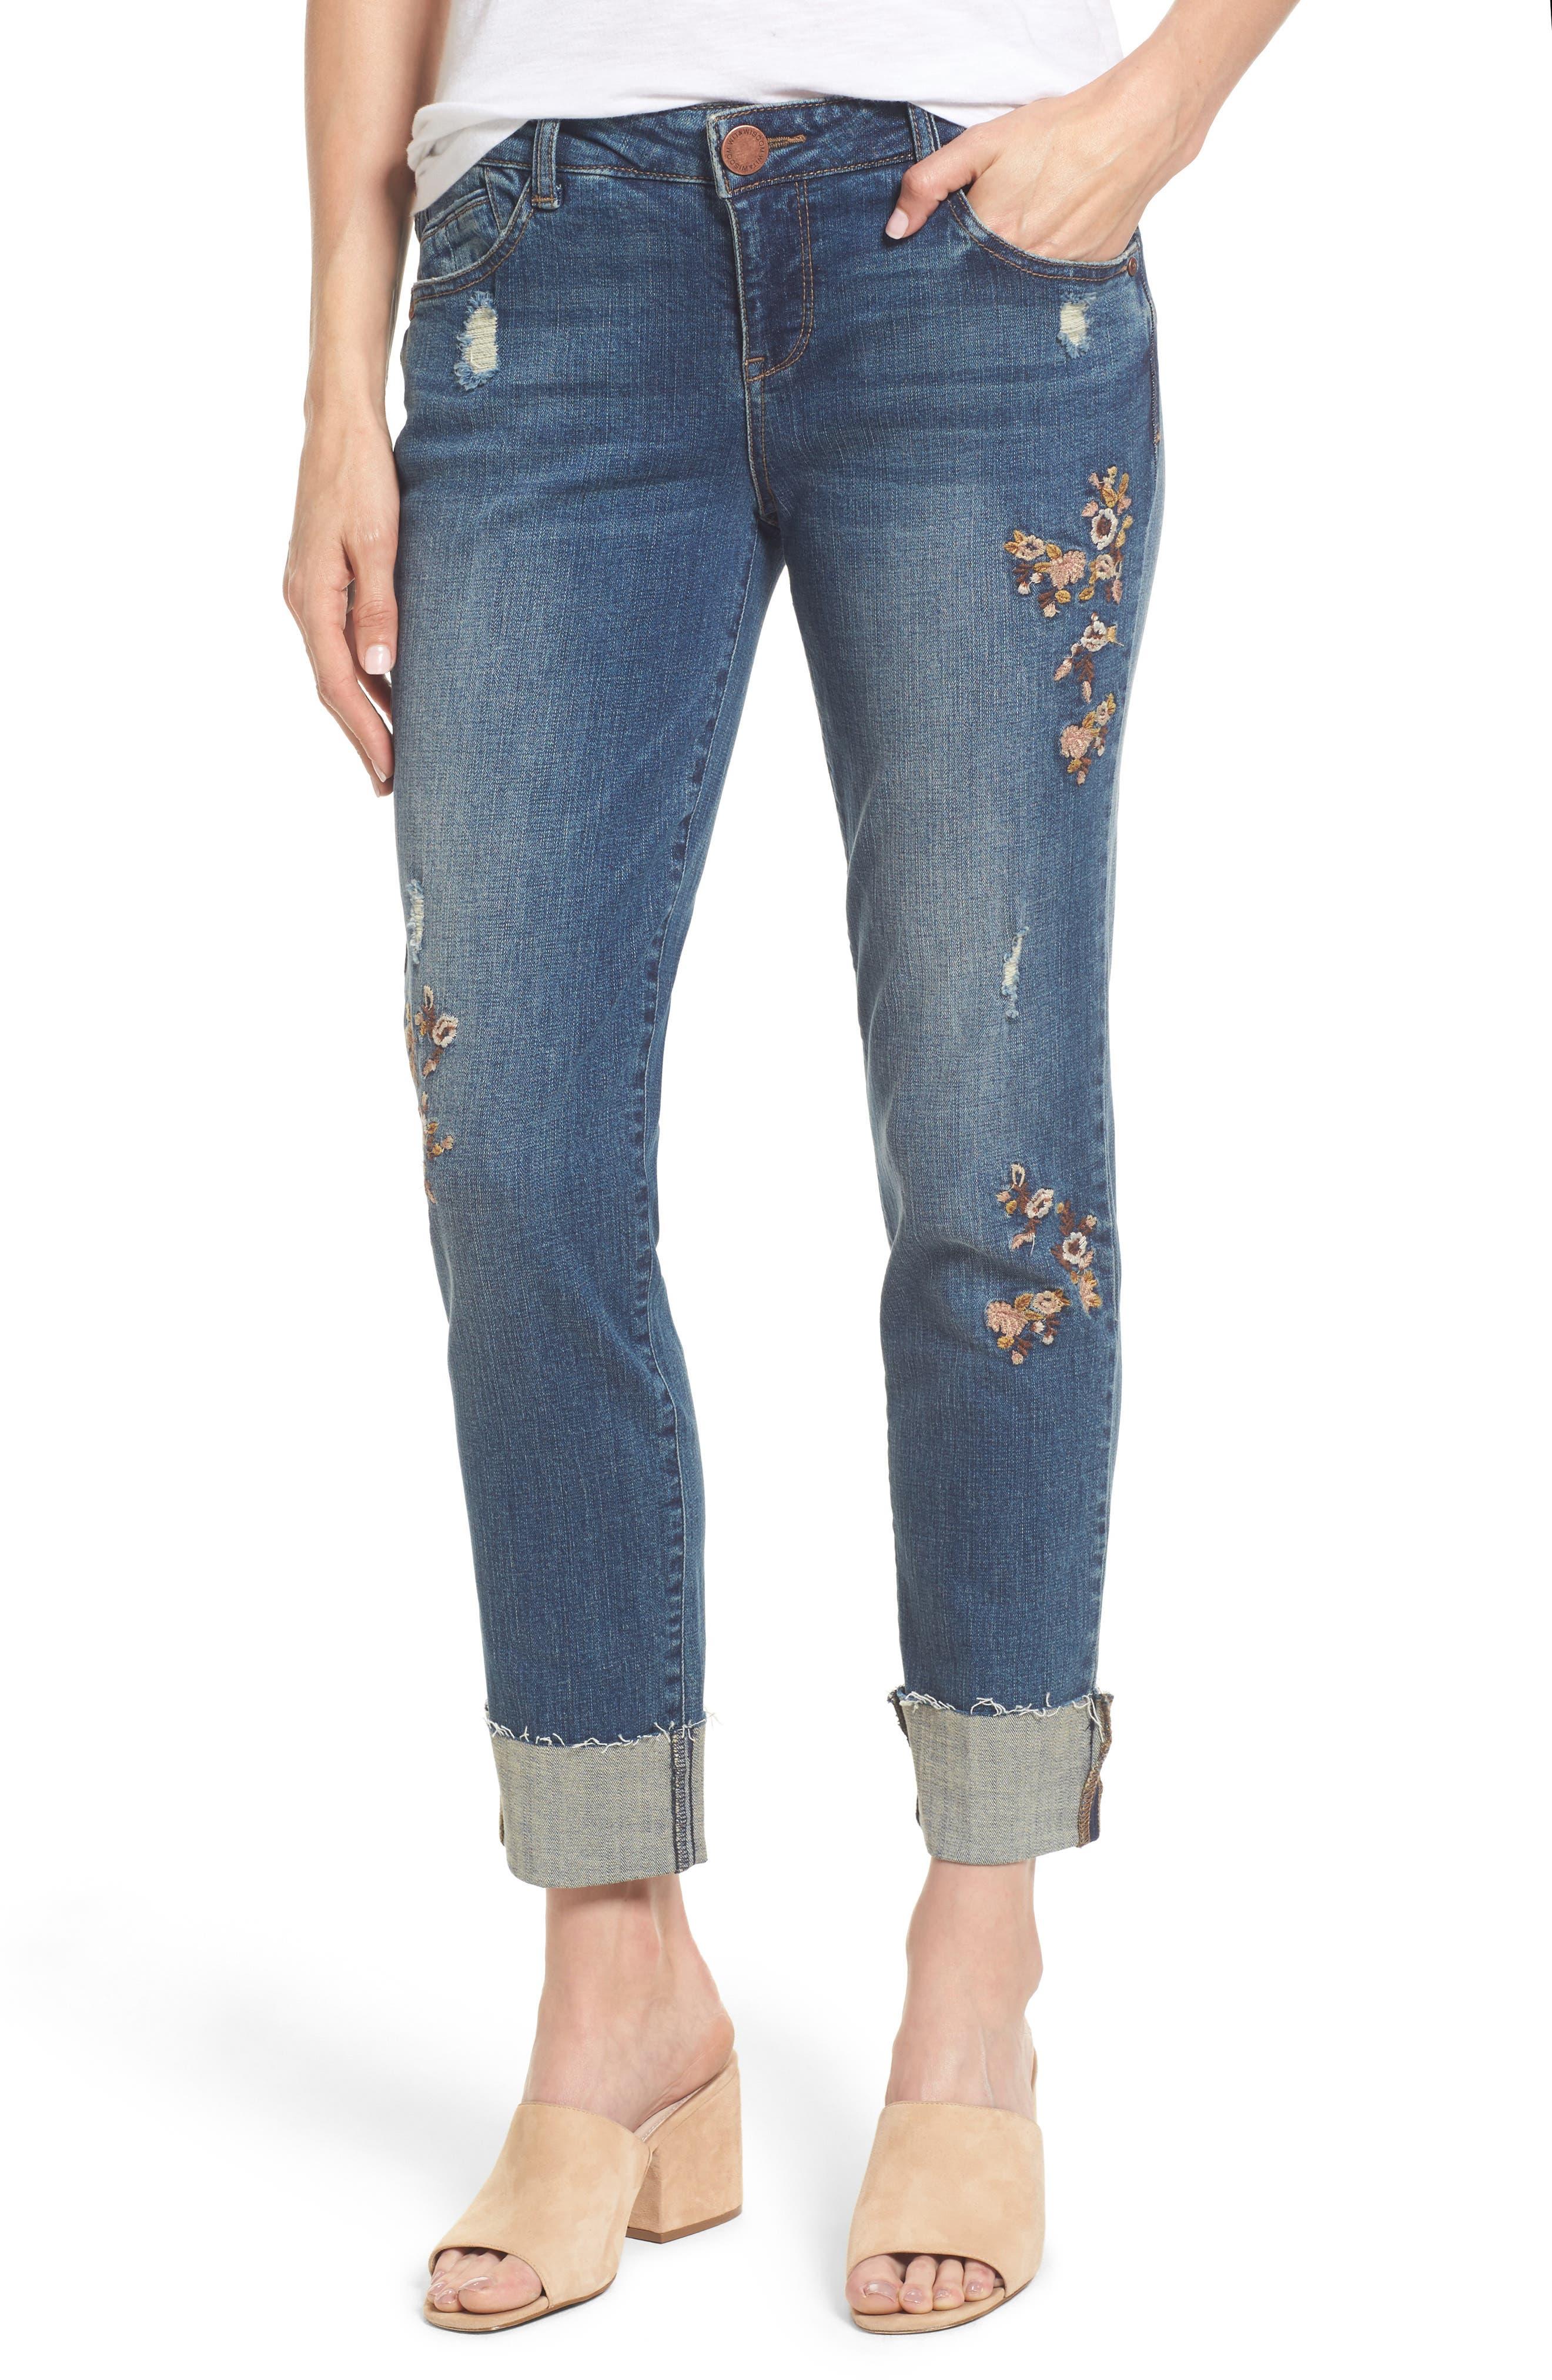 Alternate Image 1 Selected - Wit & Wisdom Flex-ellent Embroidered Boyfriend Jeans (Nordstrom Exclusive) (Regular & Petite)